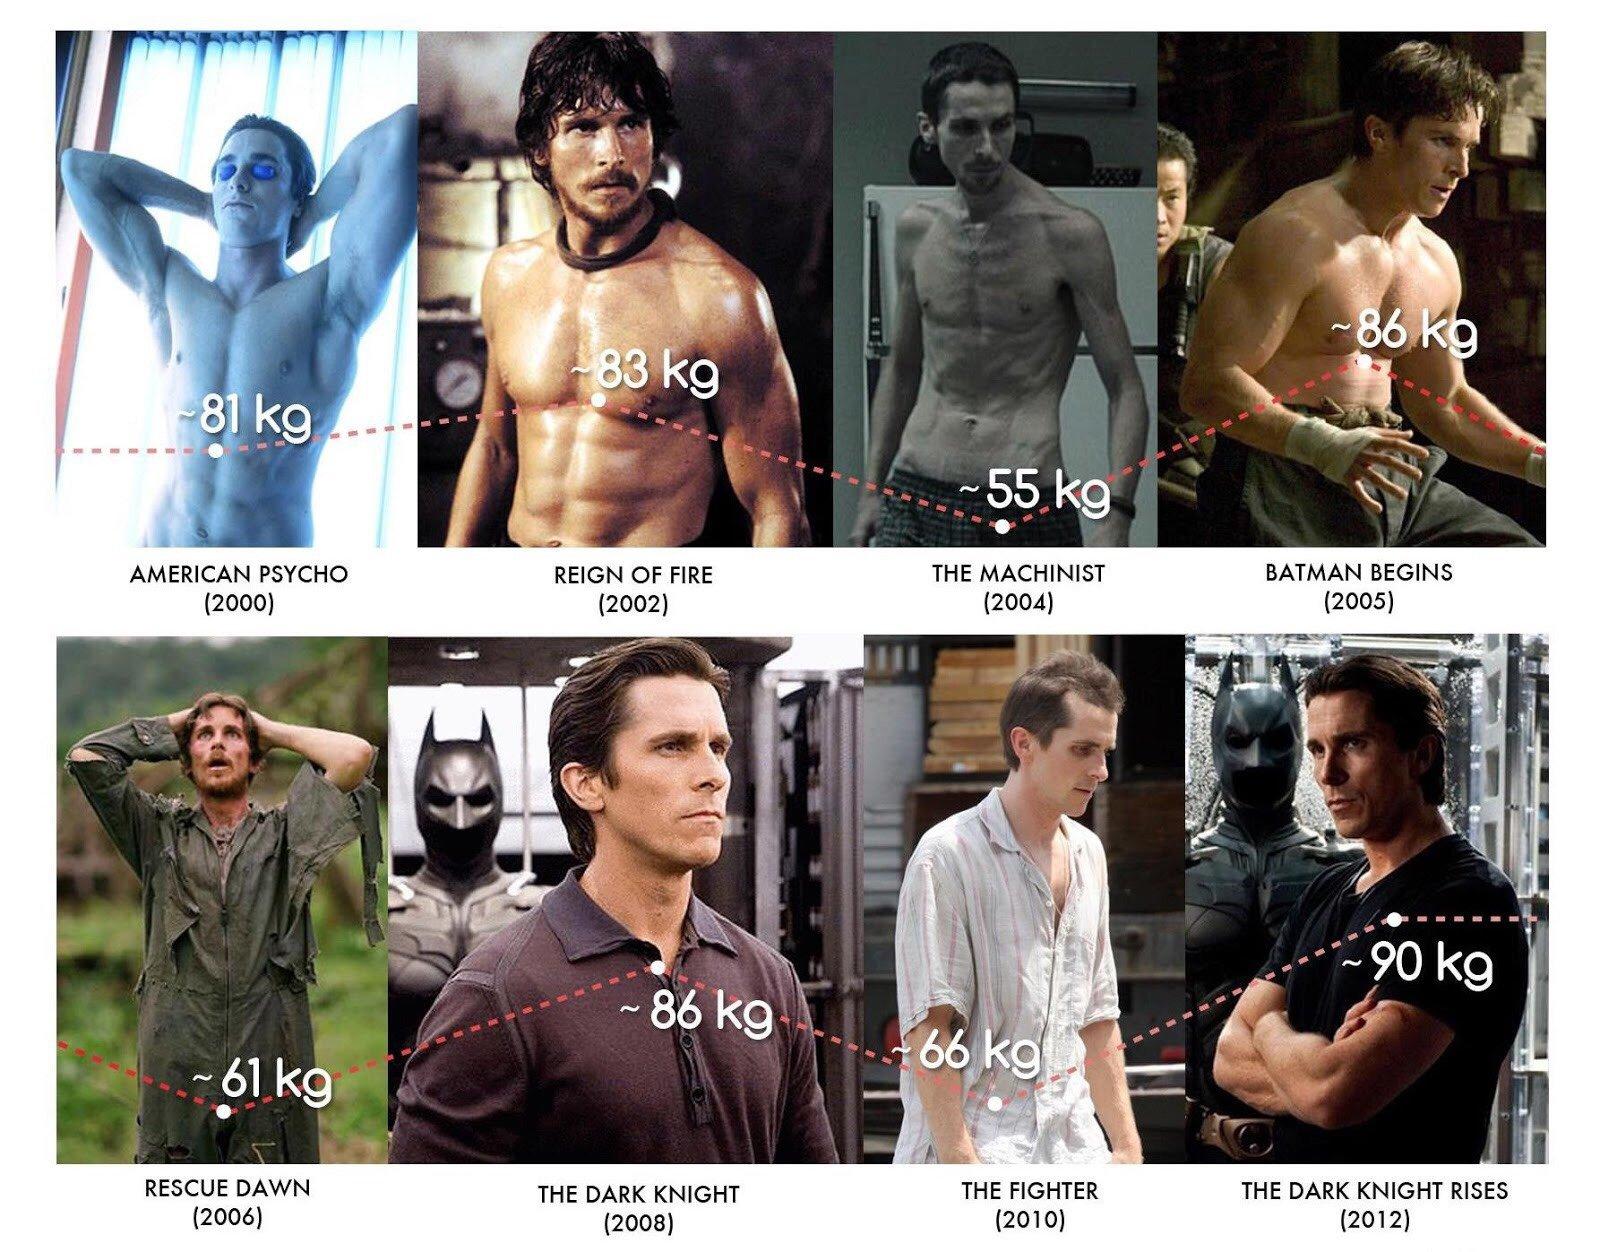 Christian Bale - metamorfozy